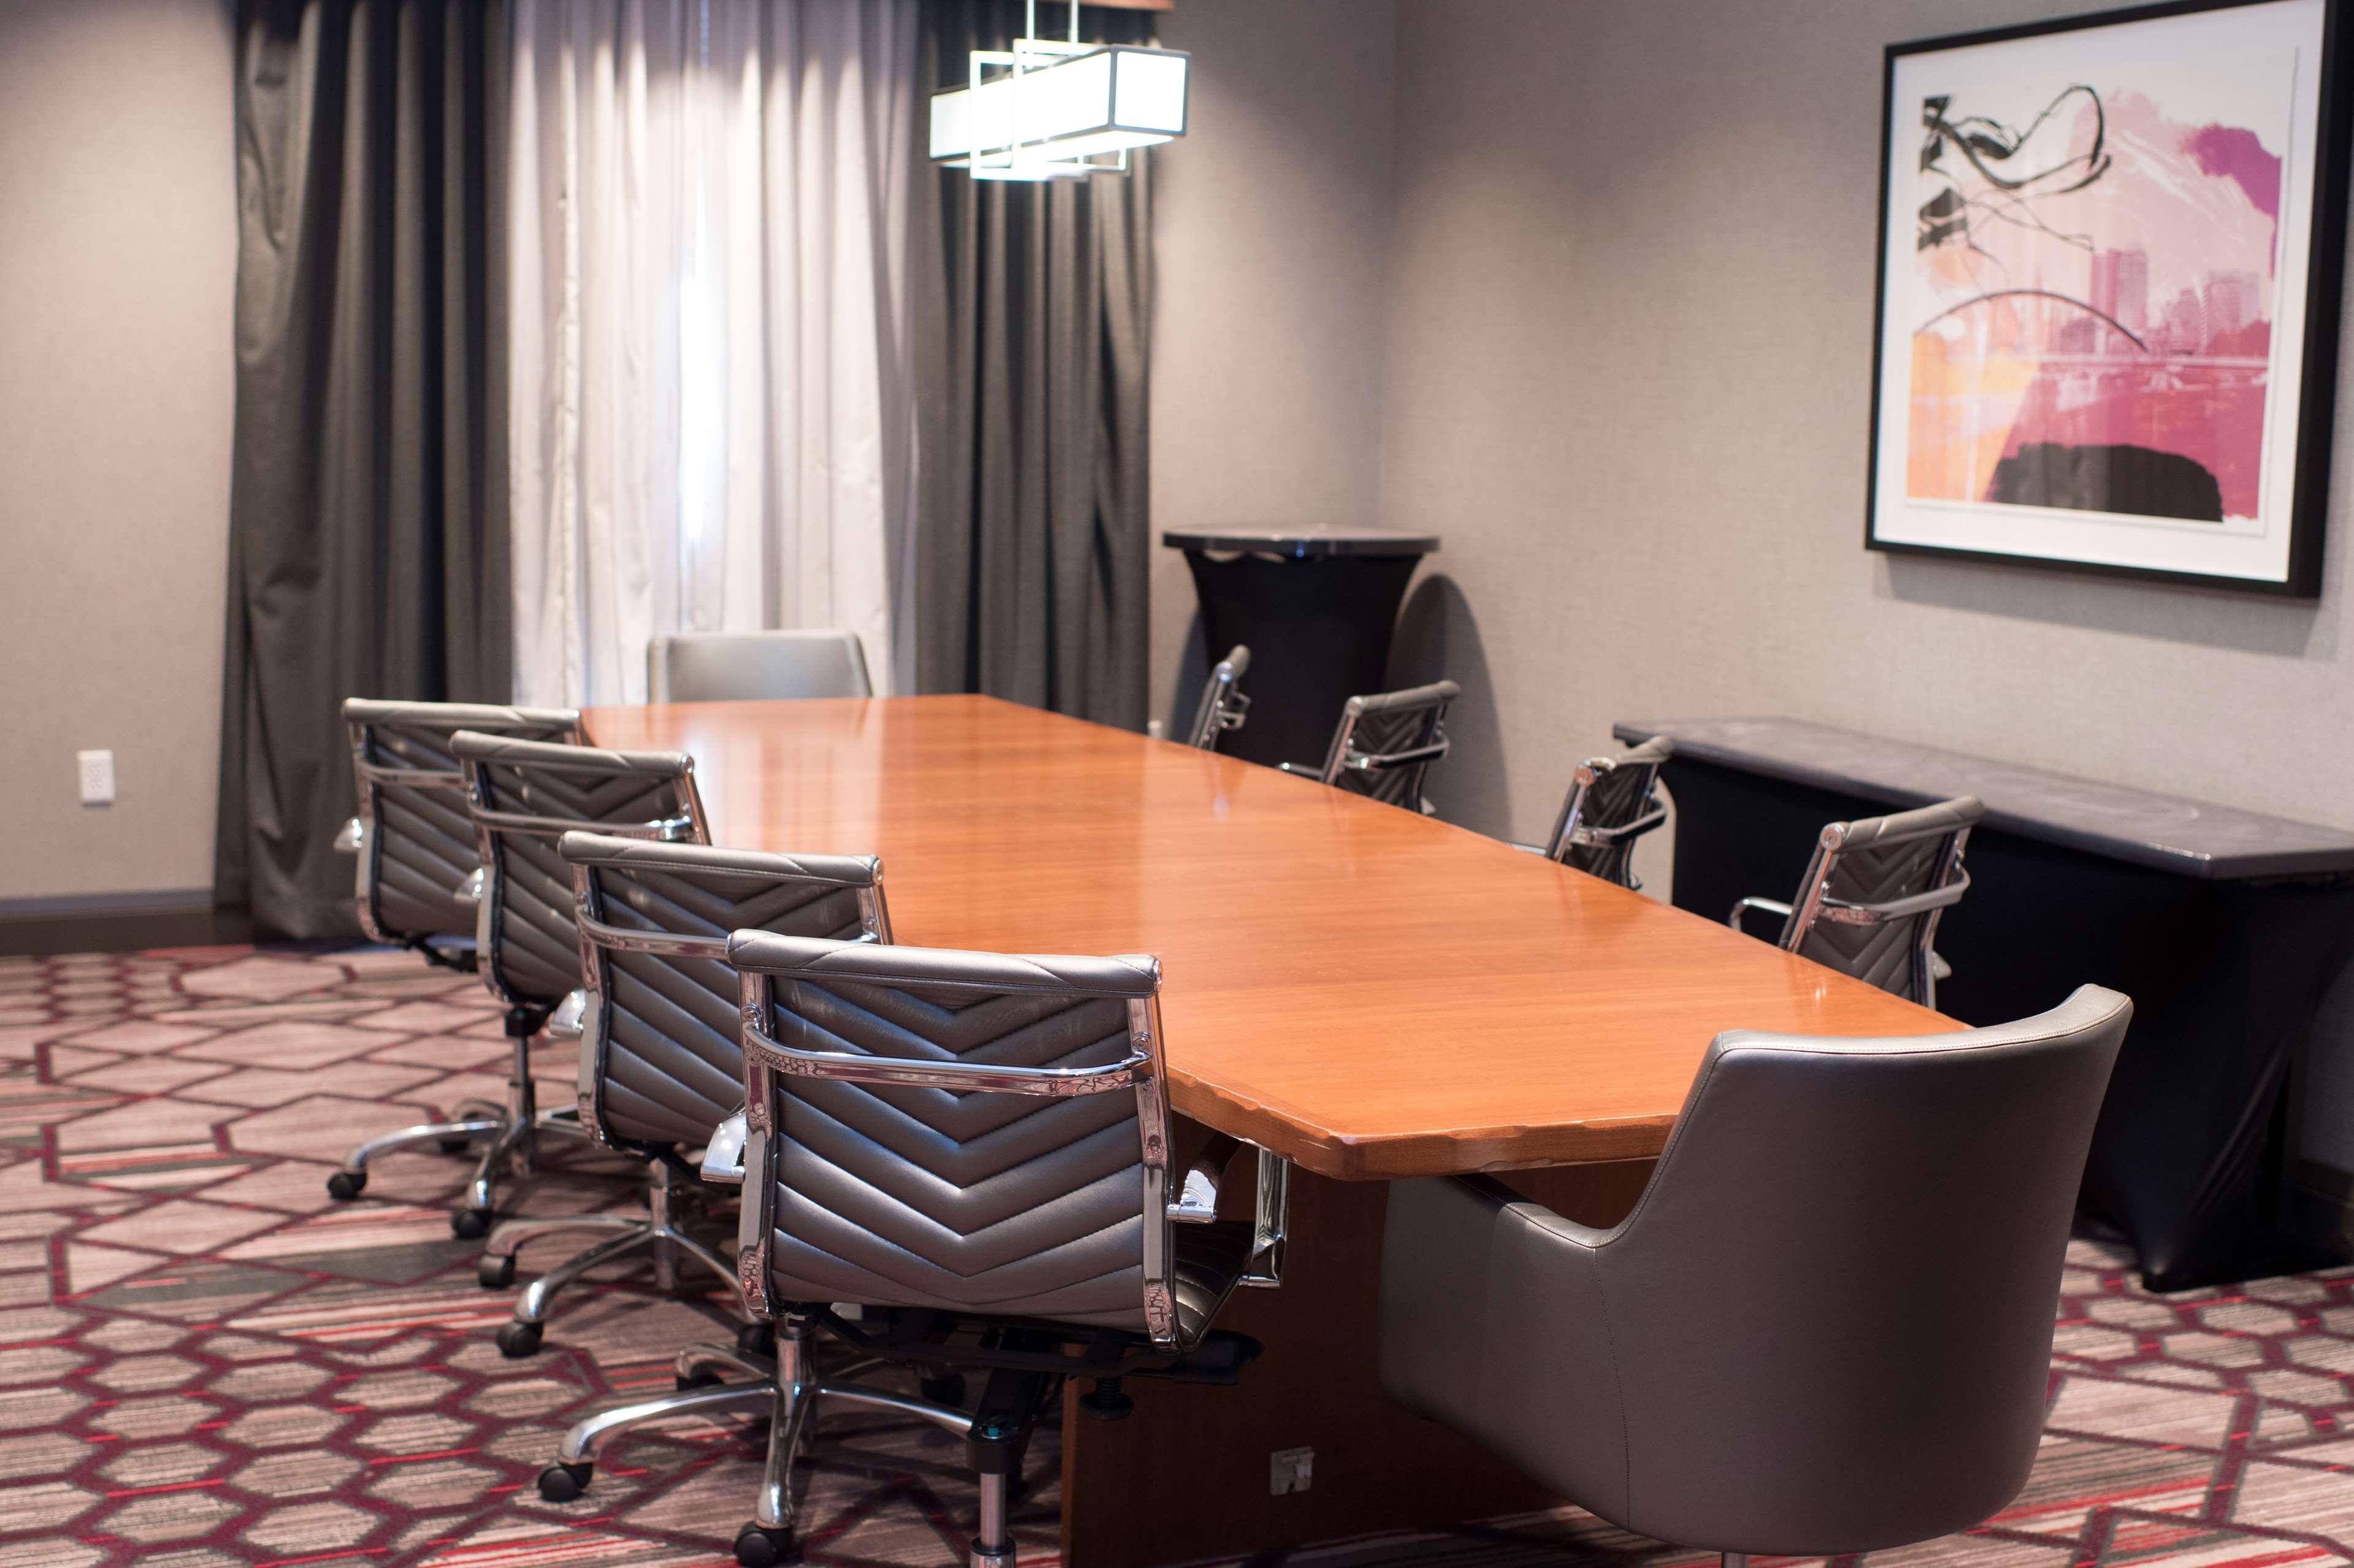 Hampton Inn & Suites Columbus-Easton Area image 57